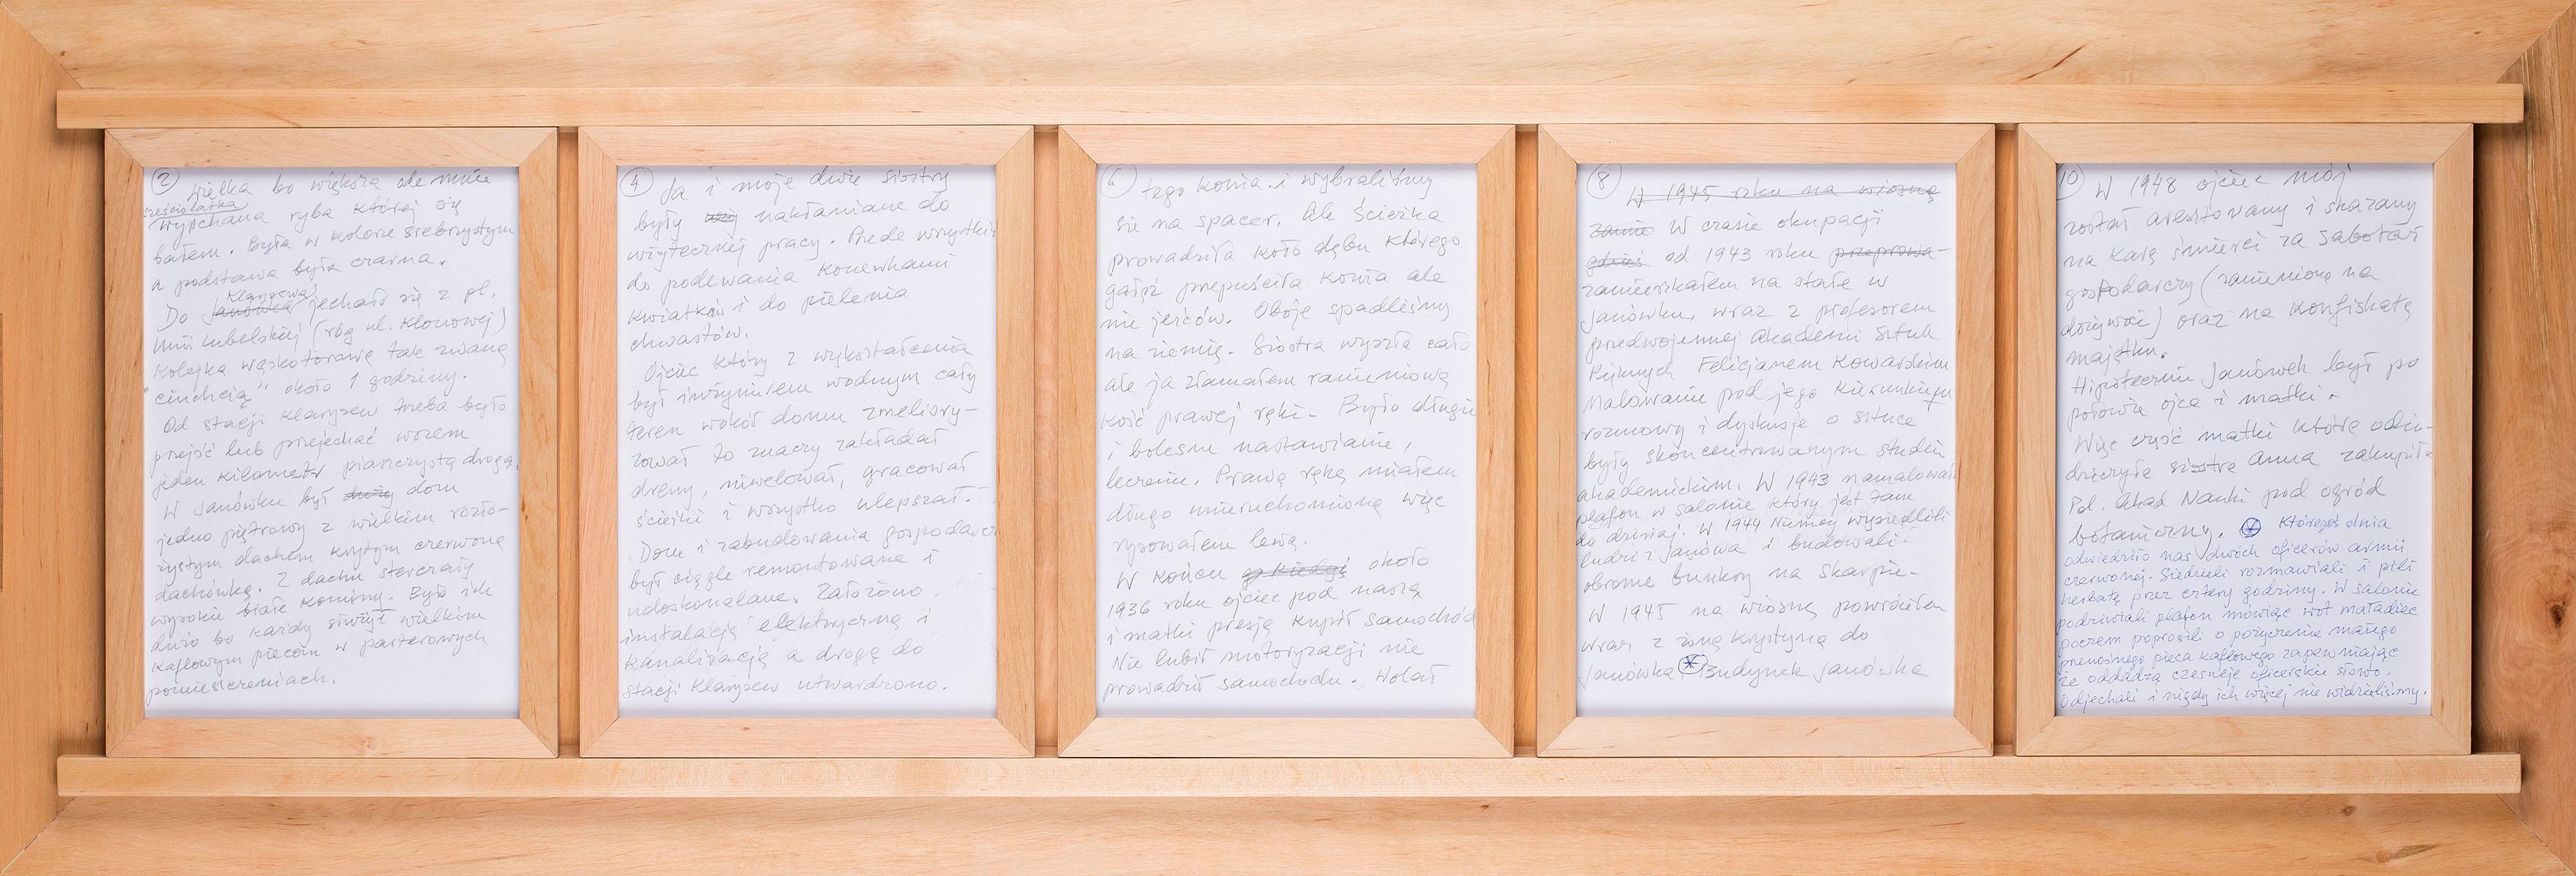 Rękopis życiorysu, 2013